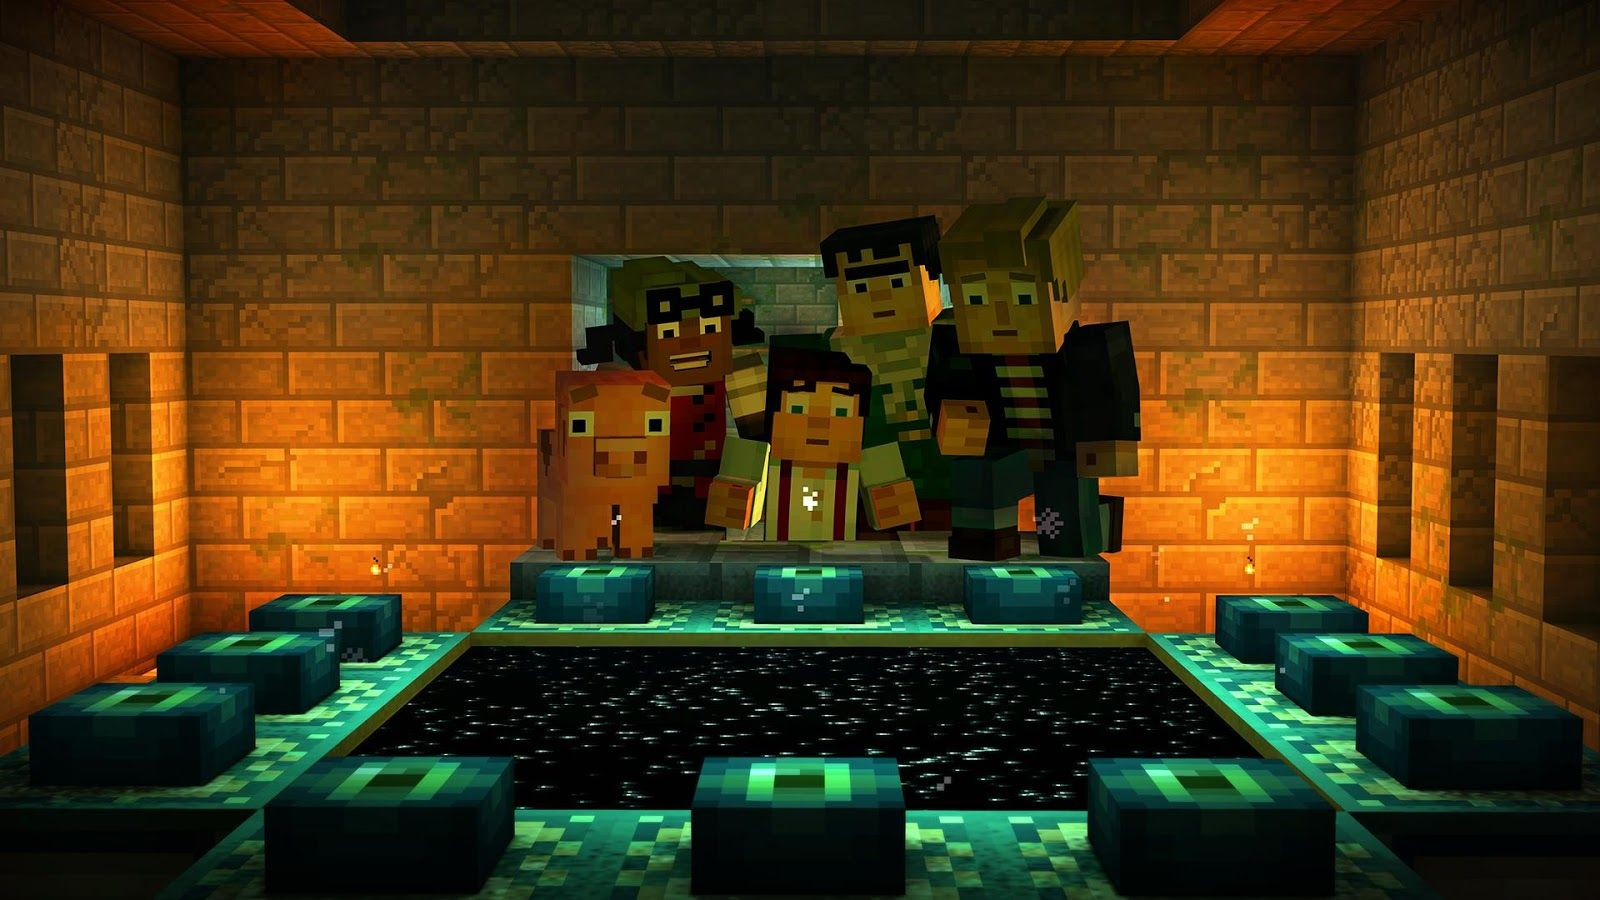 Best Wallpaper Minecraft Aaron - ba83540875979c57f475be2a8e703101  Pic_624334.jpg